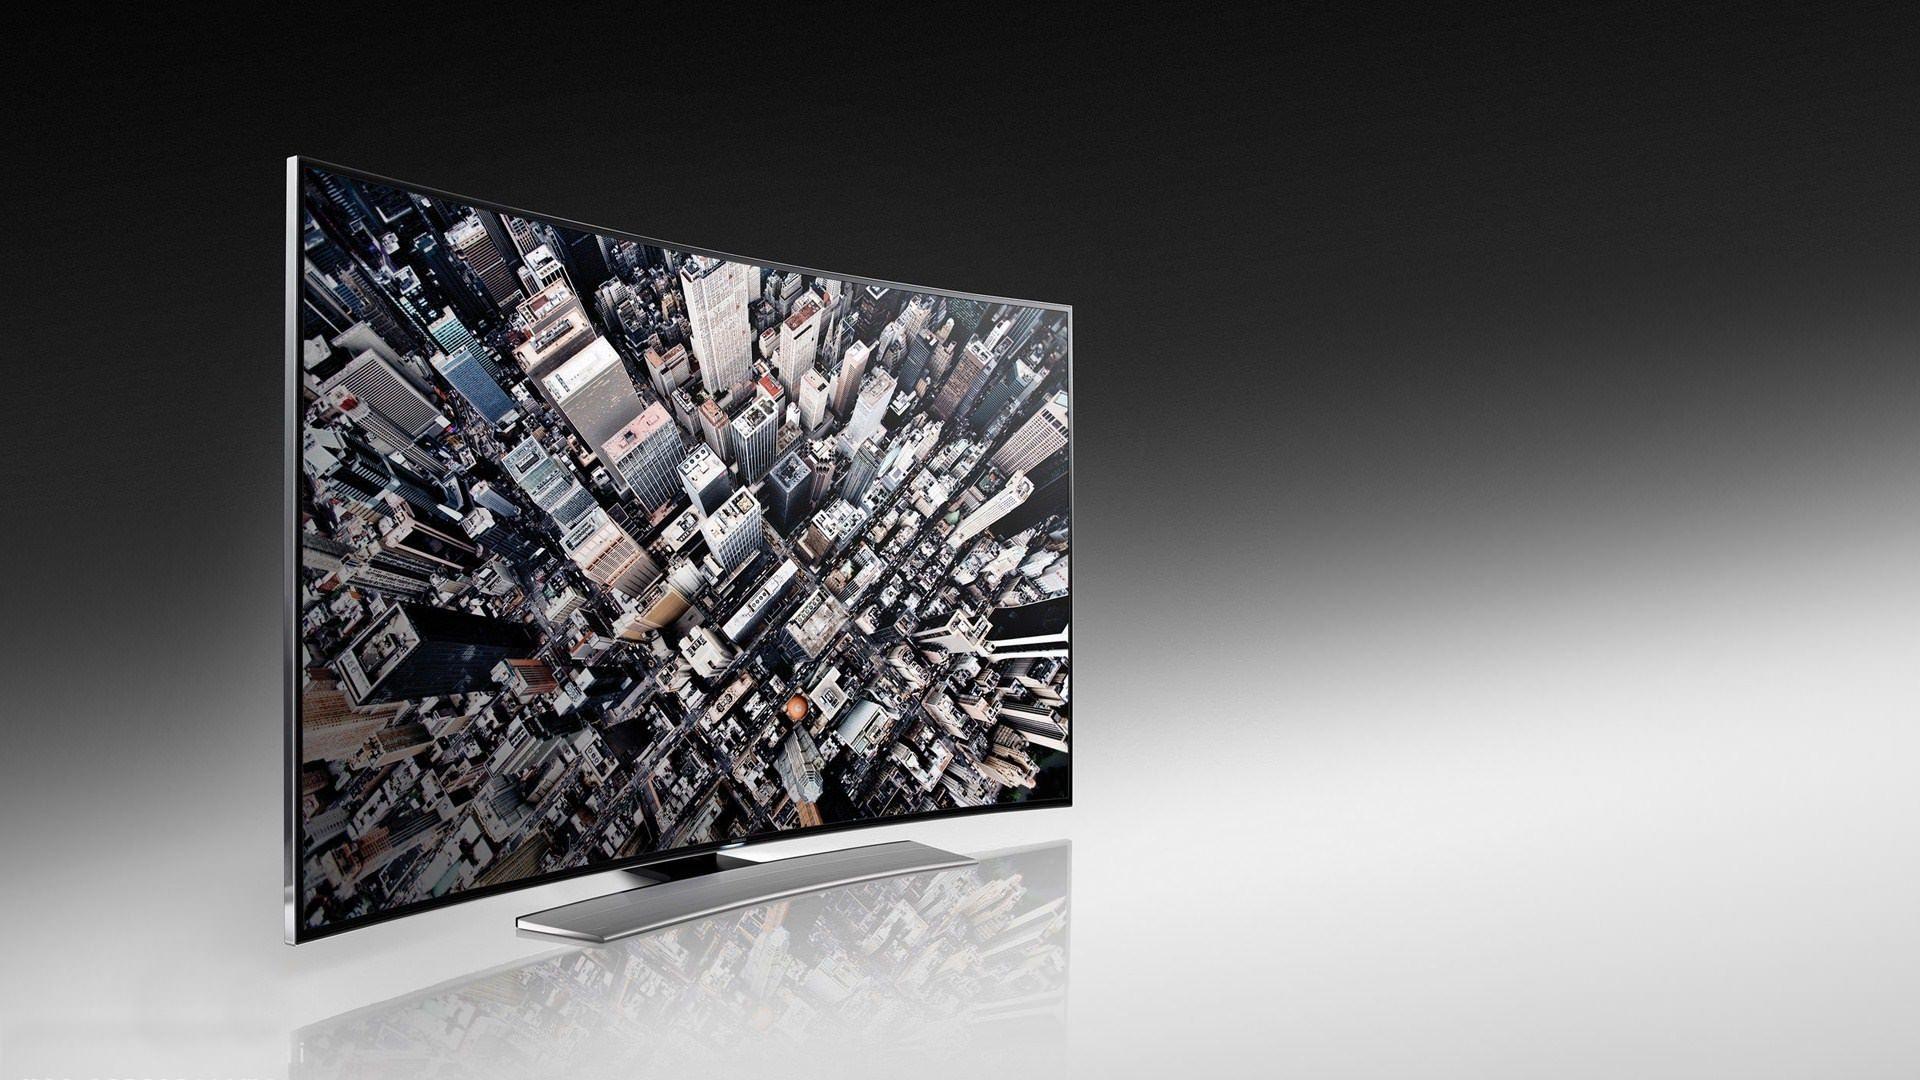 Top 5 4k Tvs For Sale Best 4k Uhd Tv Deals 2020 Tv Deals 4k Tv Cyber Monday Offers